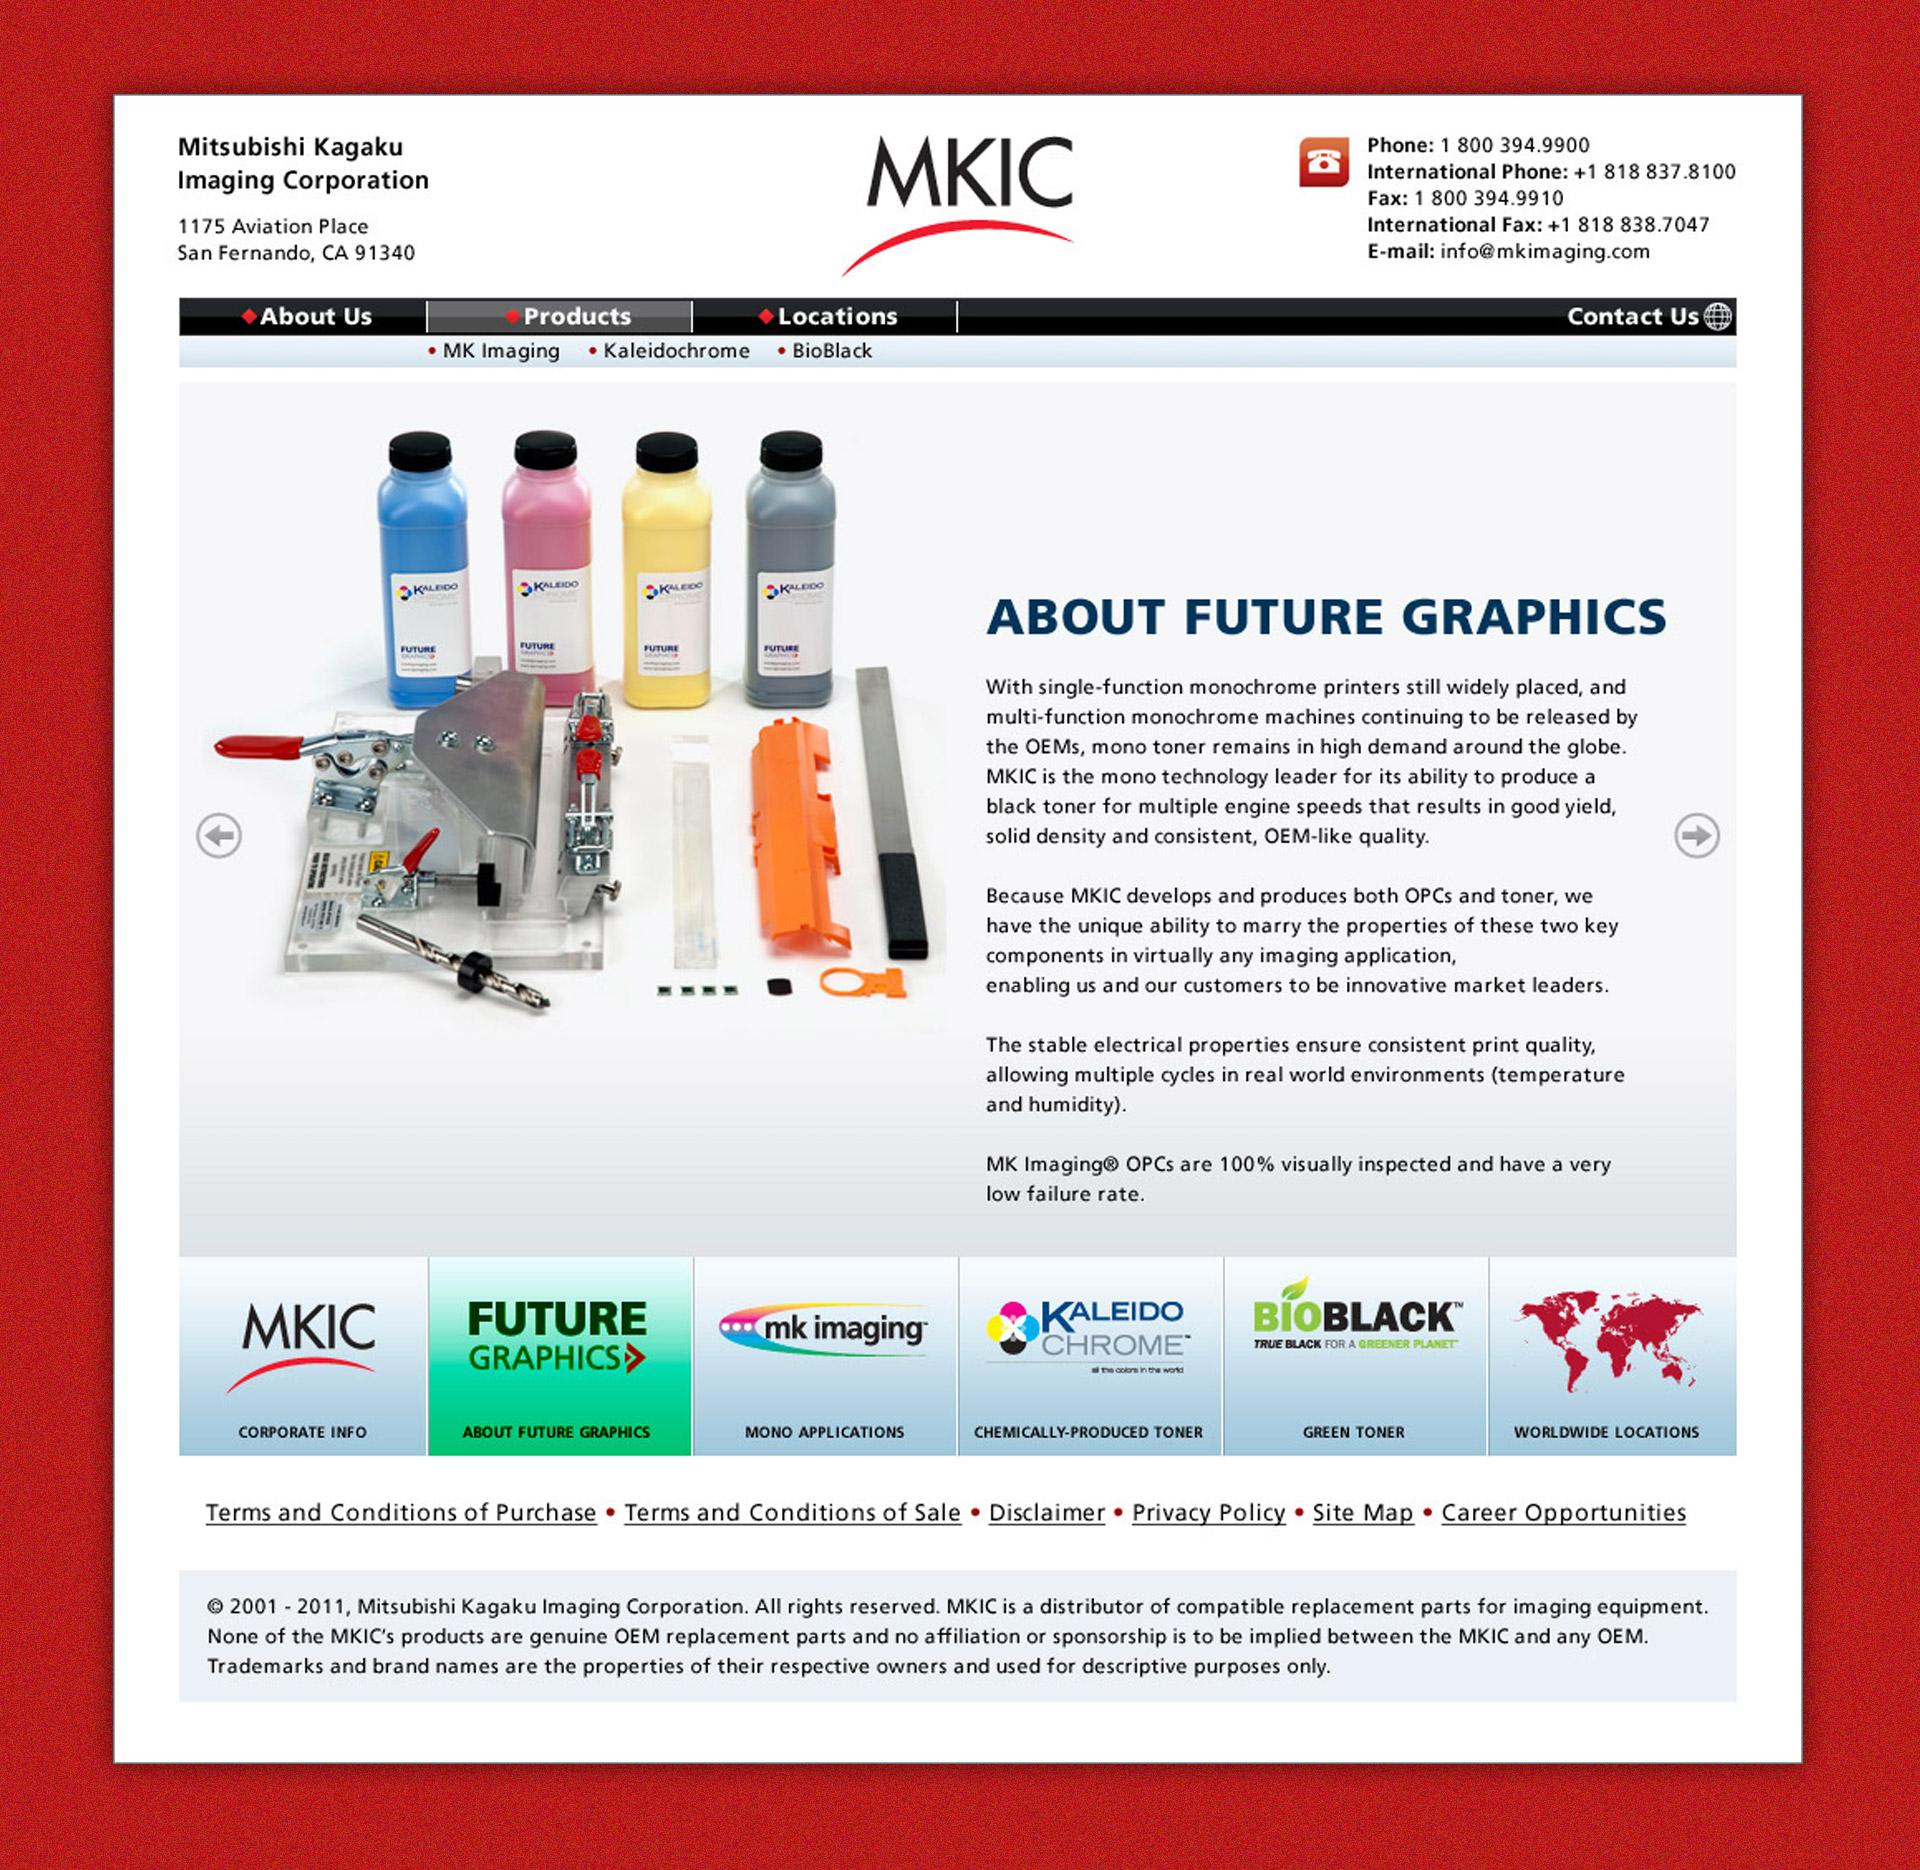 mkic_website3.jpg